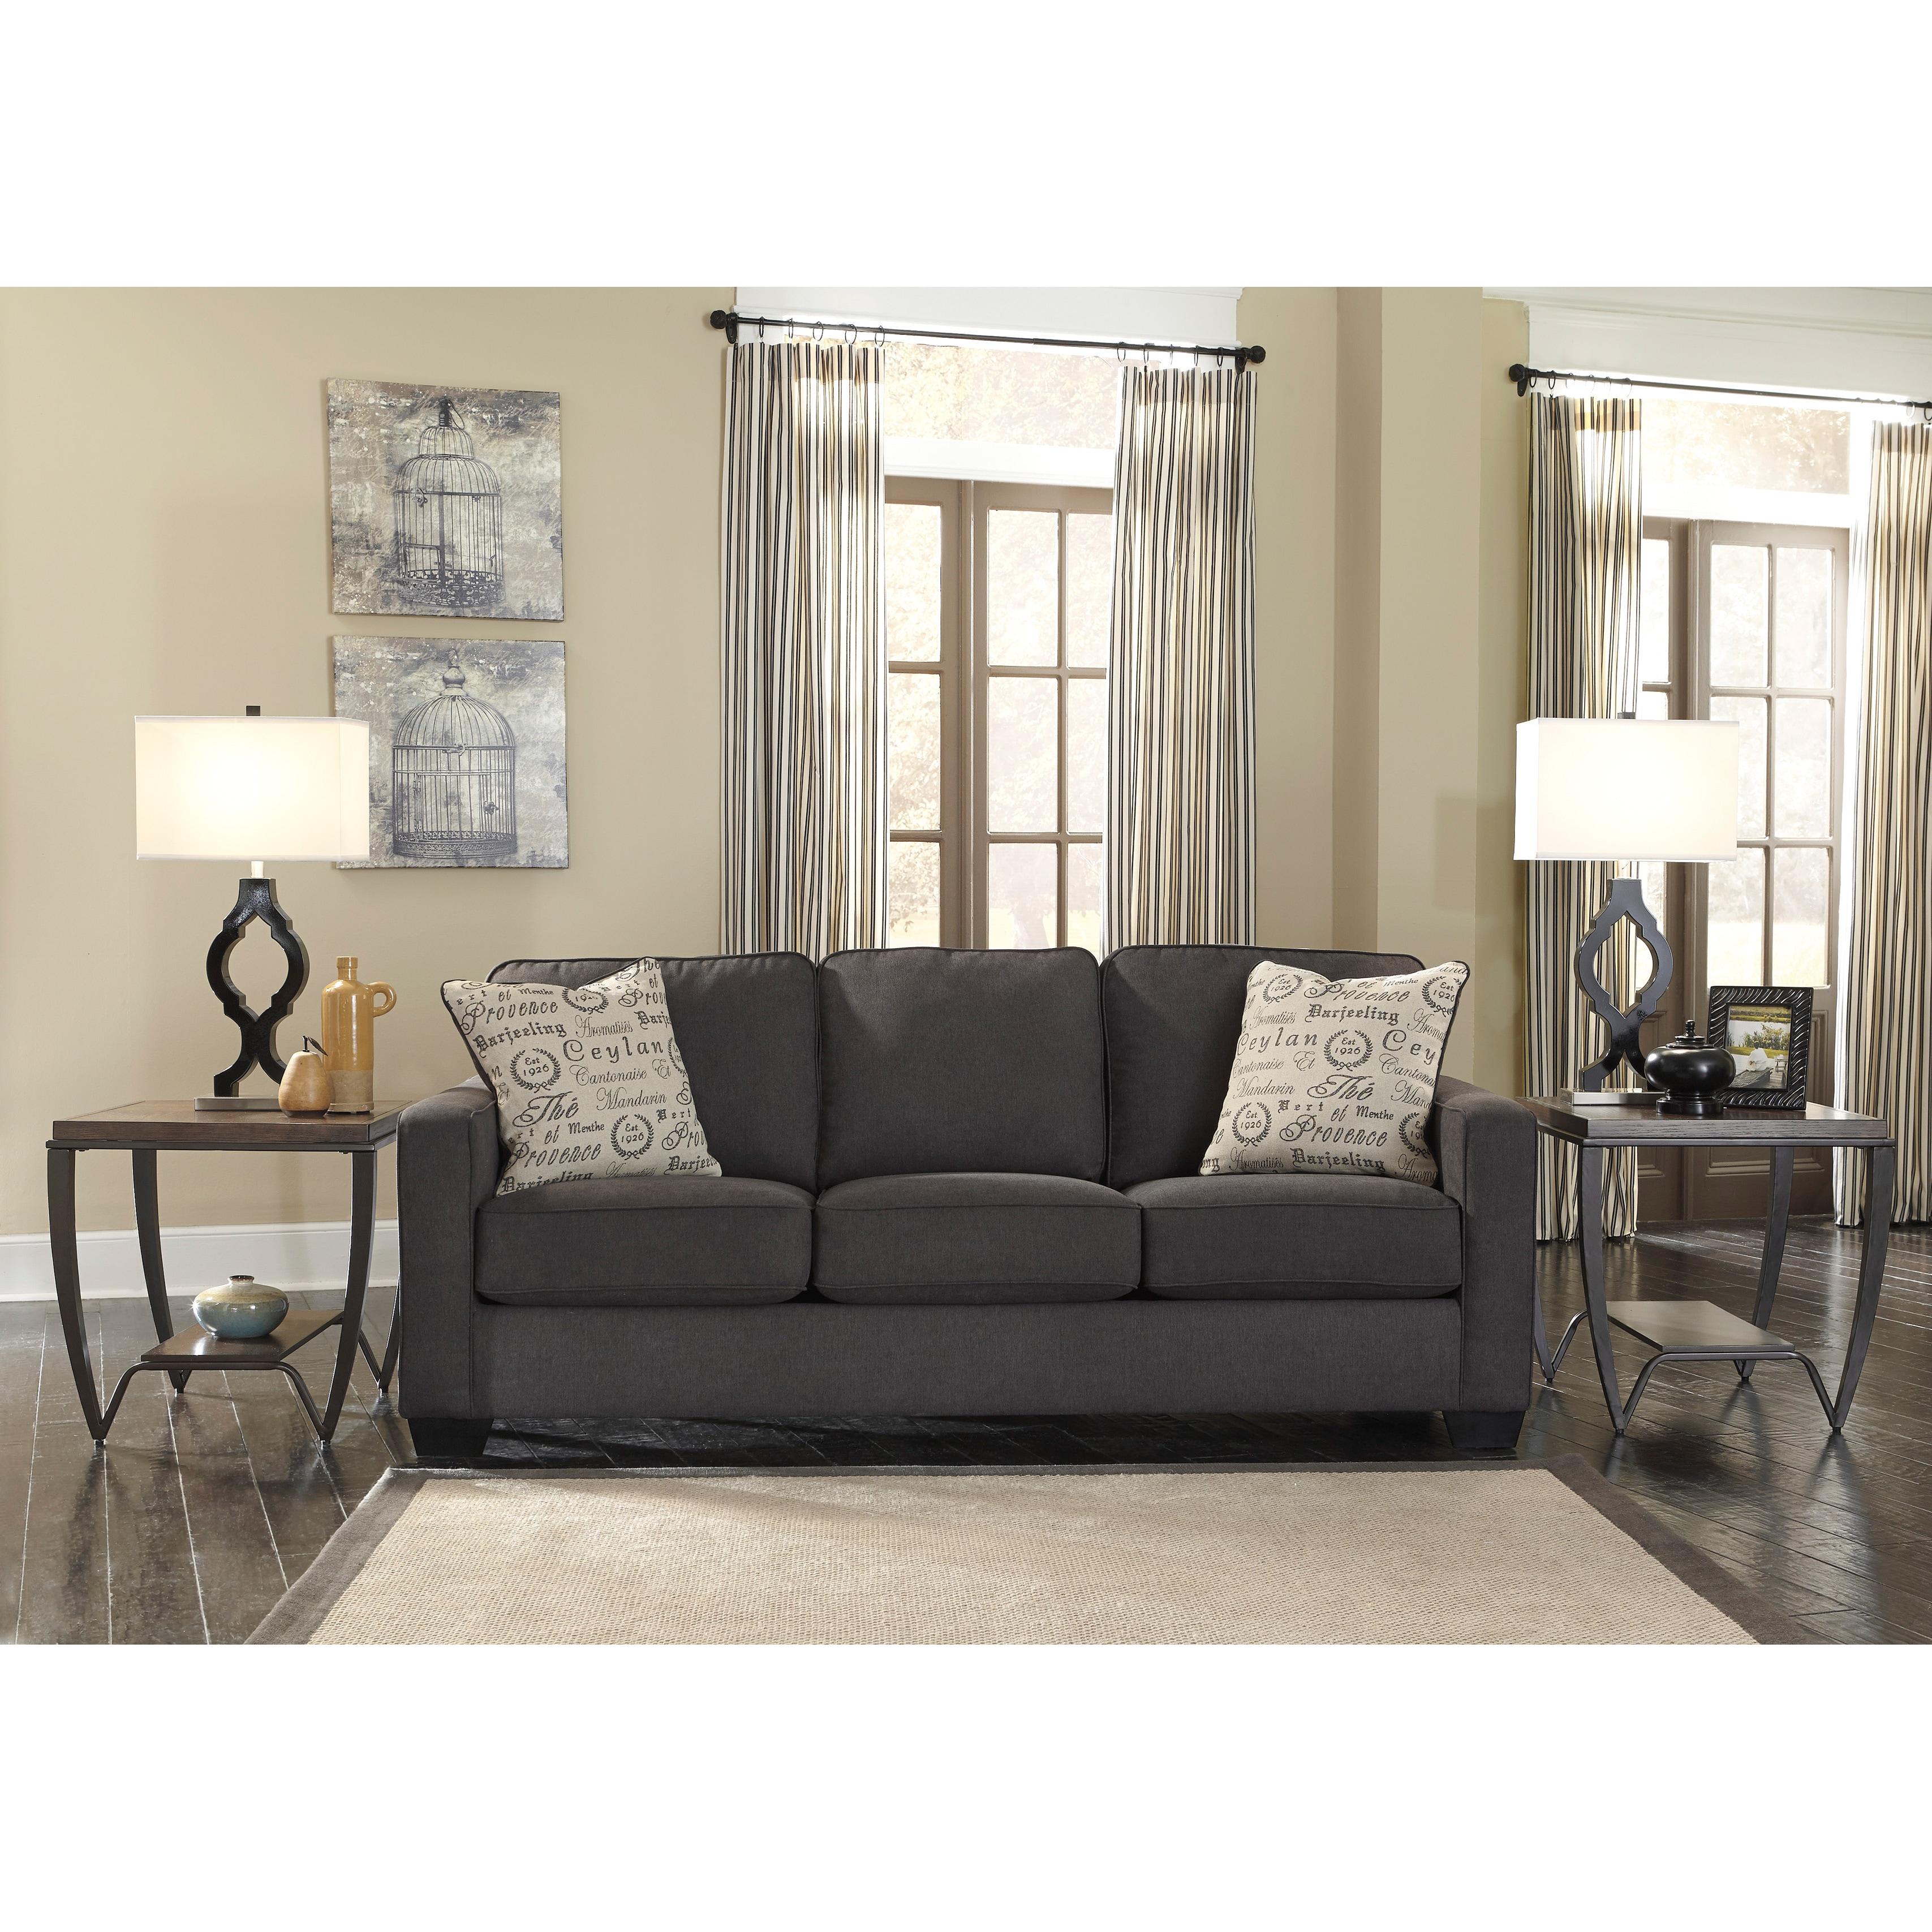 Alenya Charcoal Sofa And Accent Pillows